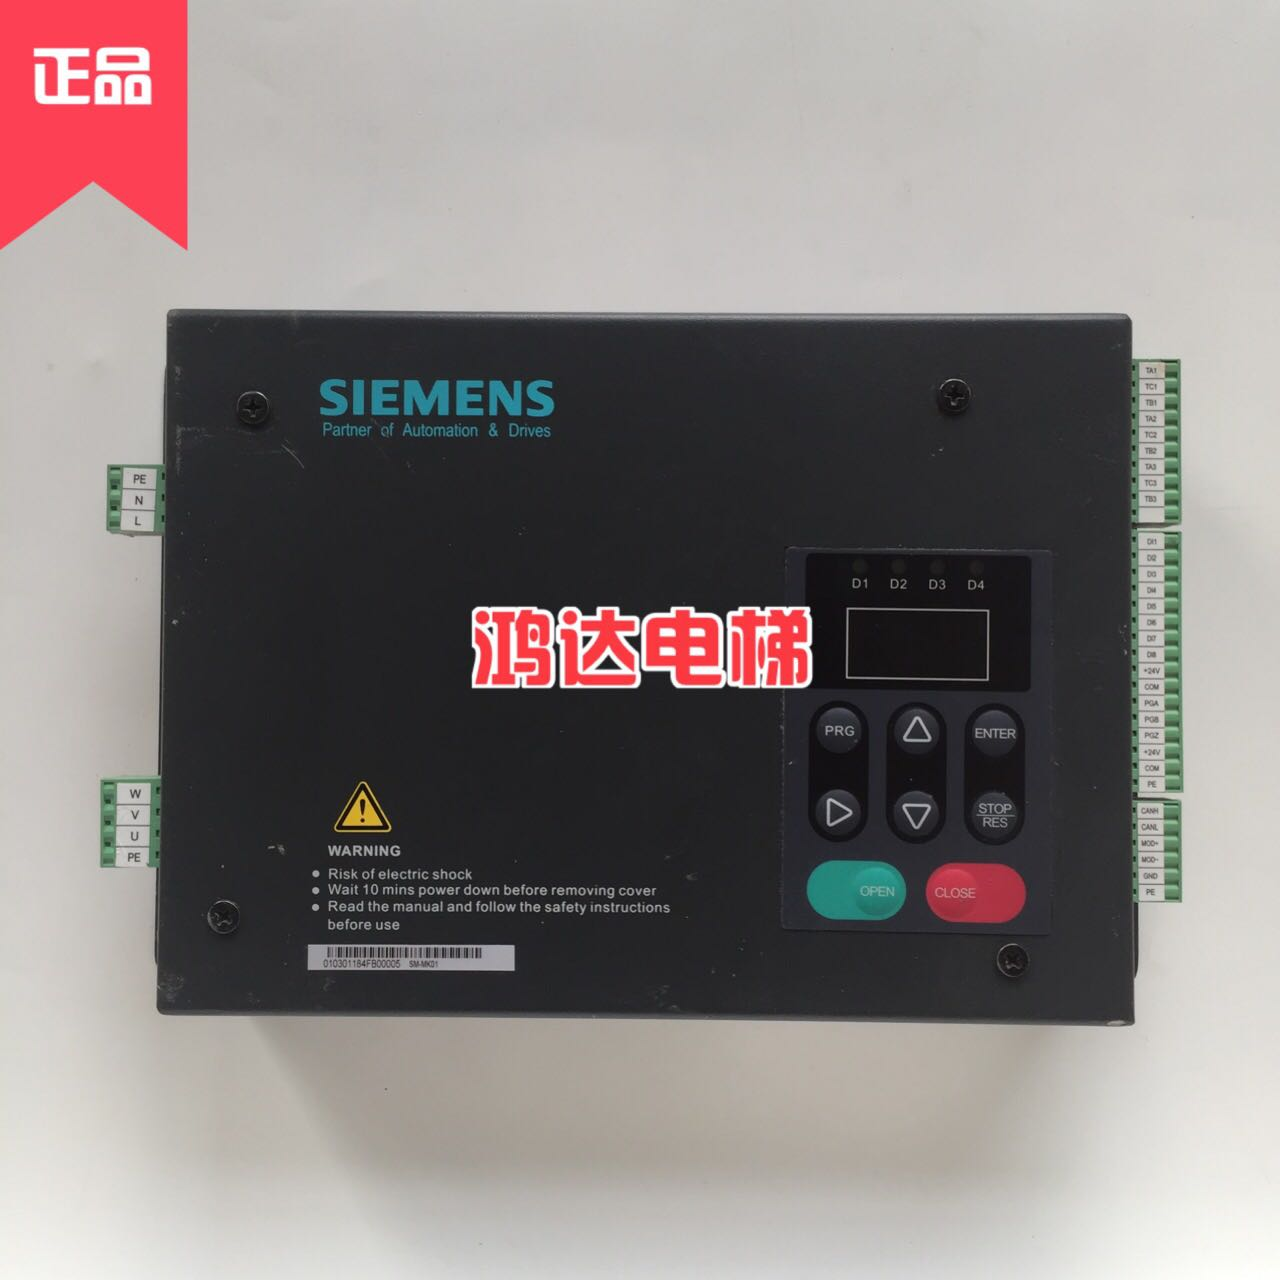 Elevator accessories / SIEMENS door machine inverter /SM-MK01/ original factory spot quality assurance